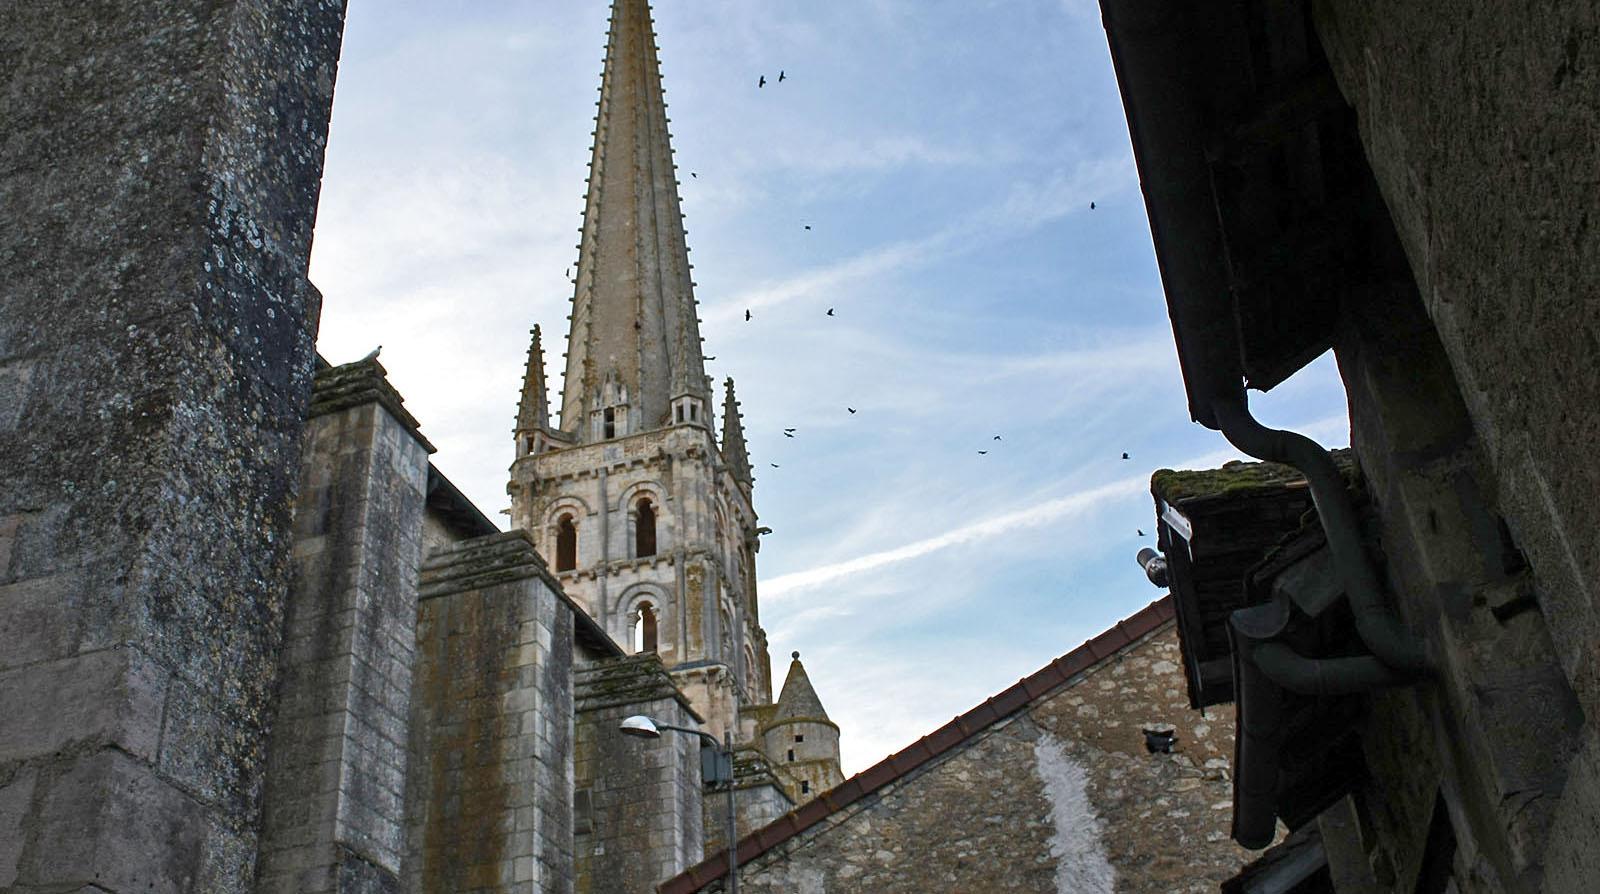 Abbaye de Saint-Savin : patrimoine mondial de l'humanité